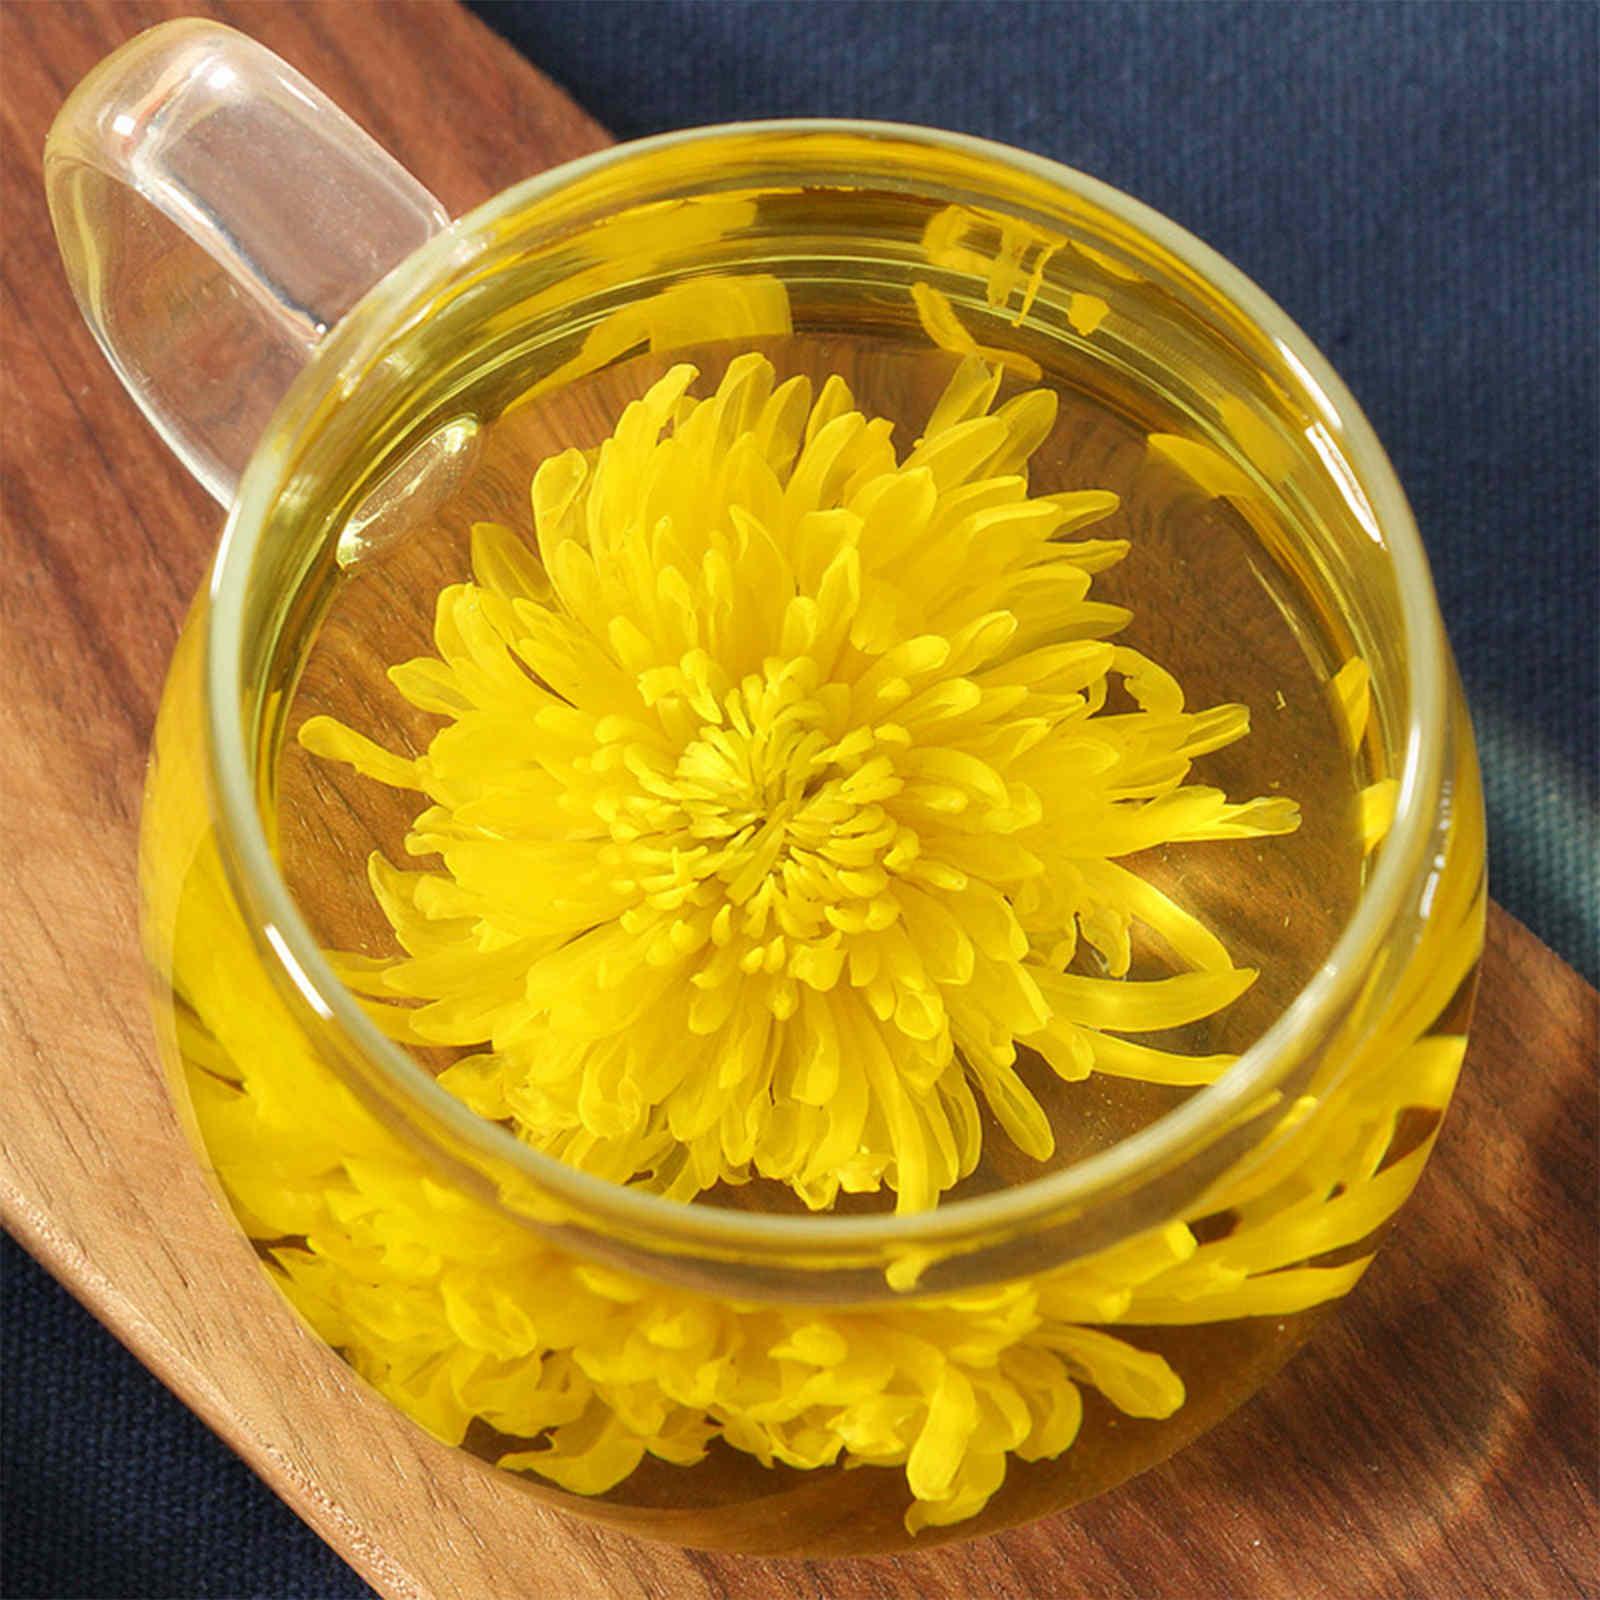 Complete golden chrysanthemum flower tea big blooming dry giant complete golden chrysanthemum flower tea big blooming dry giant blossom bagged mightylinksfo